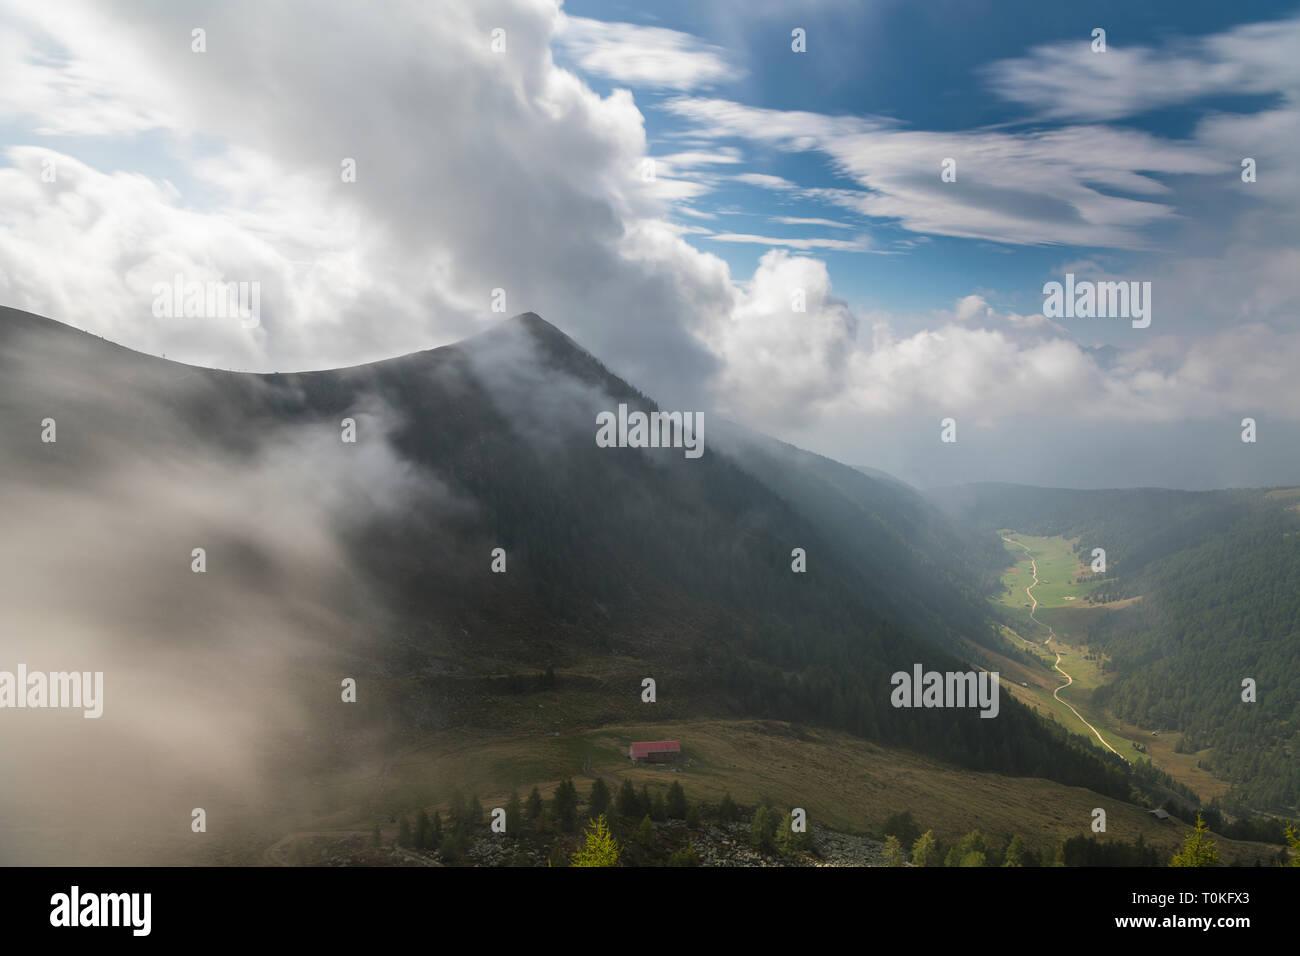 Hike to Seefeldspitze, Valser Tal, Pfunderer Berge, South Tyrol, Italy Stock Photo